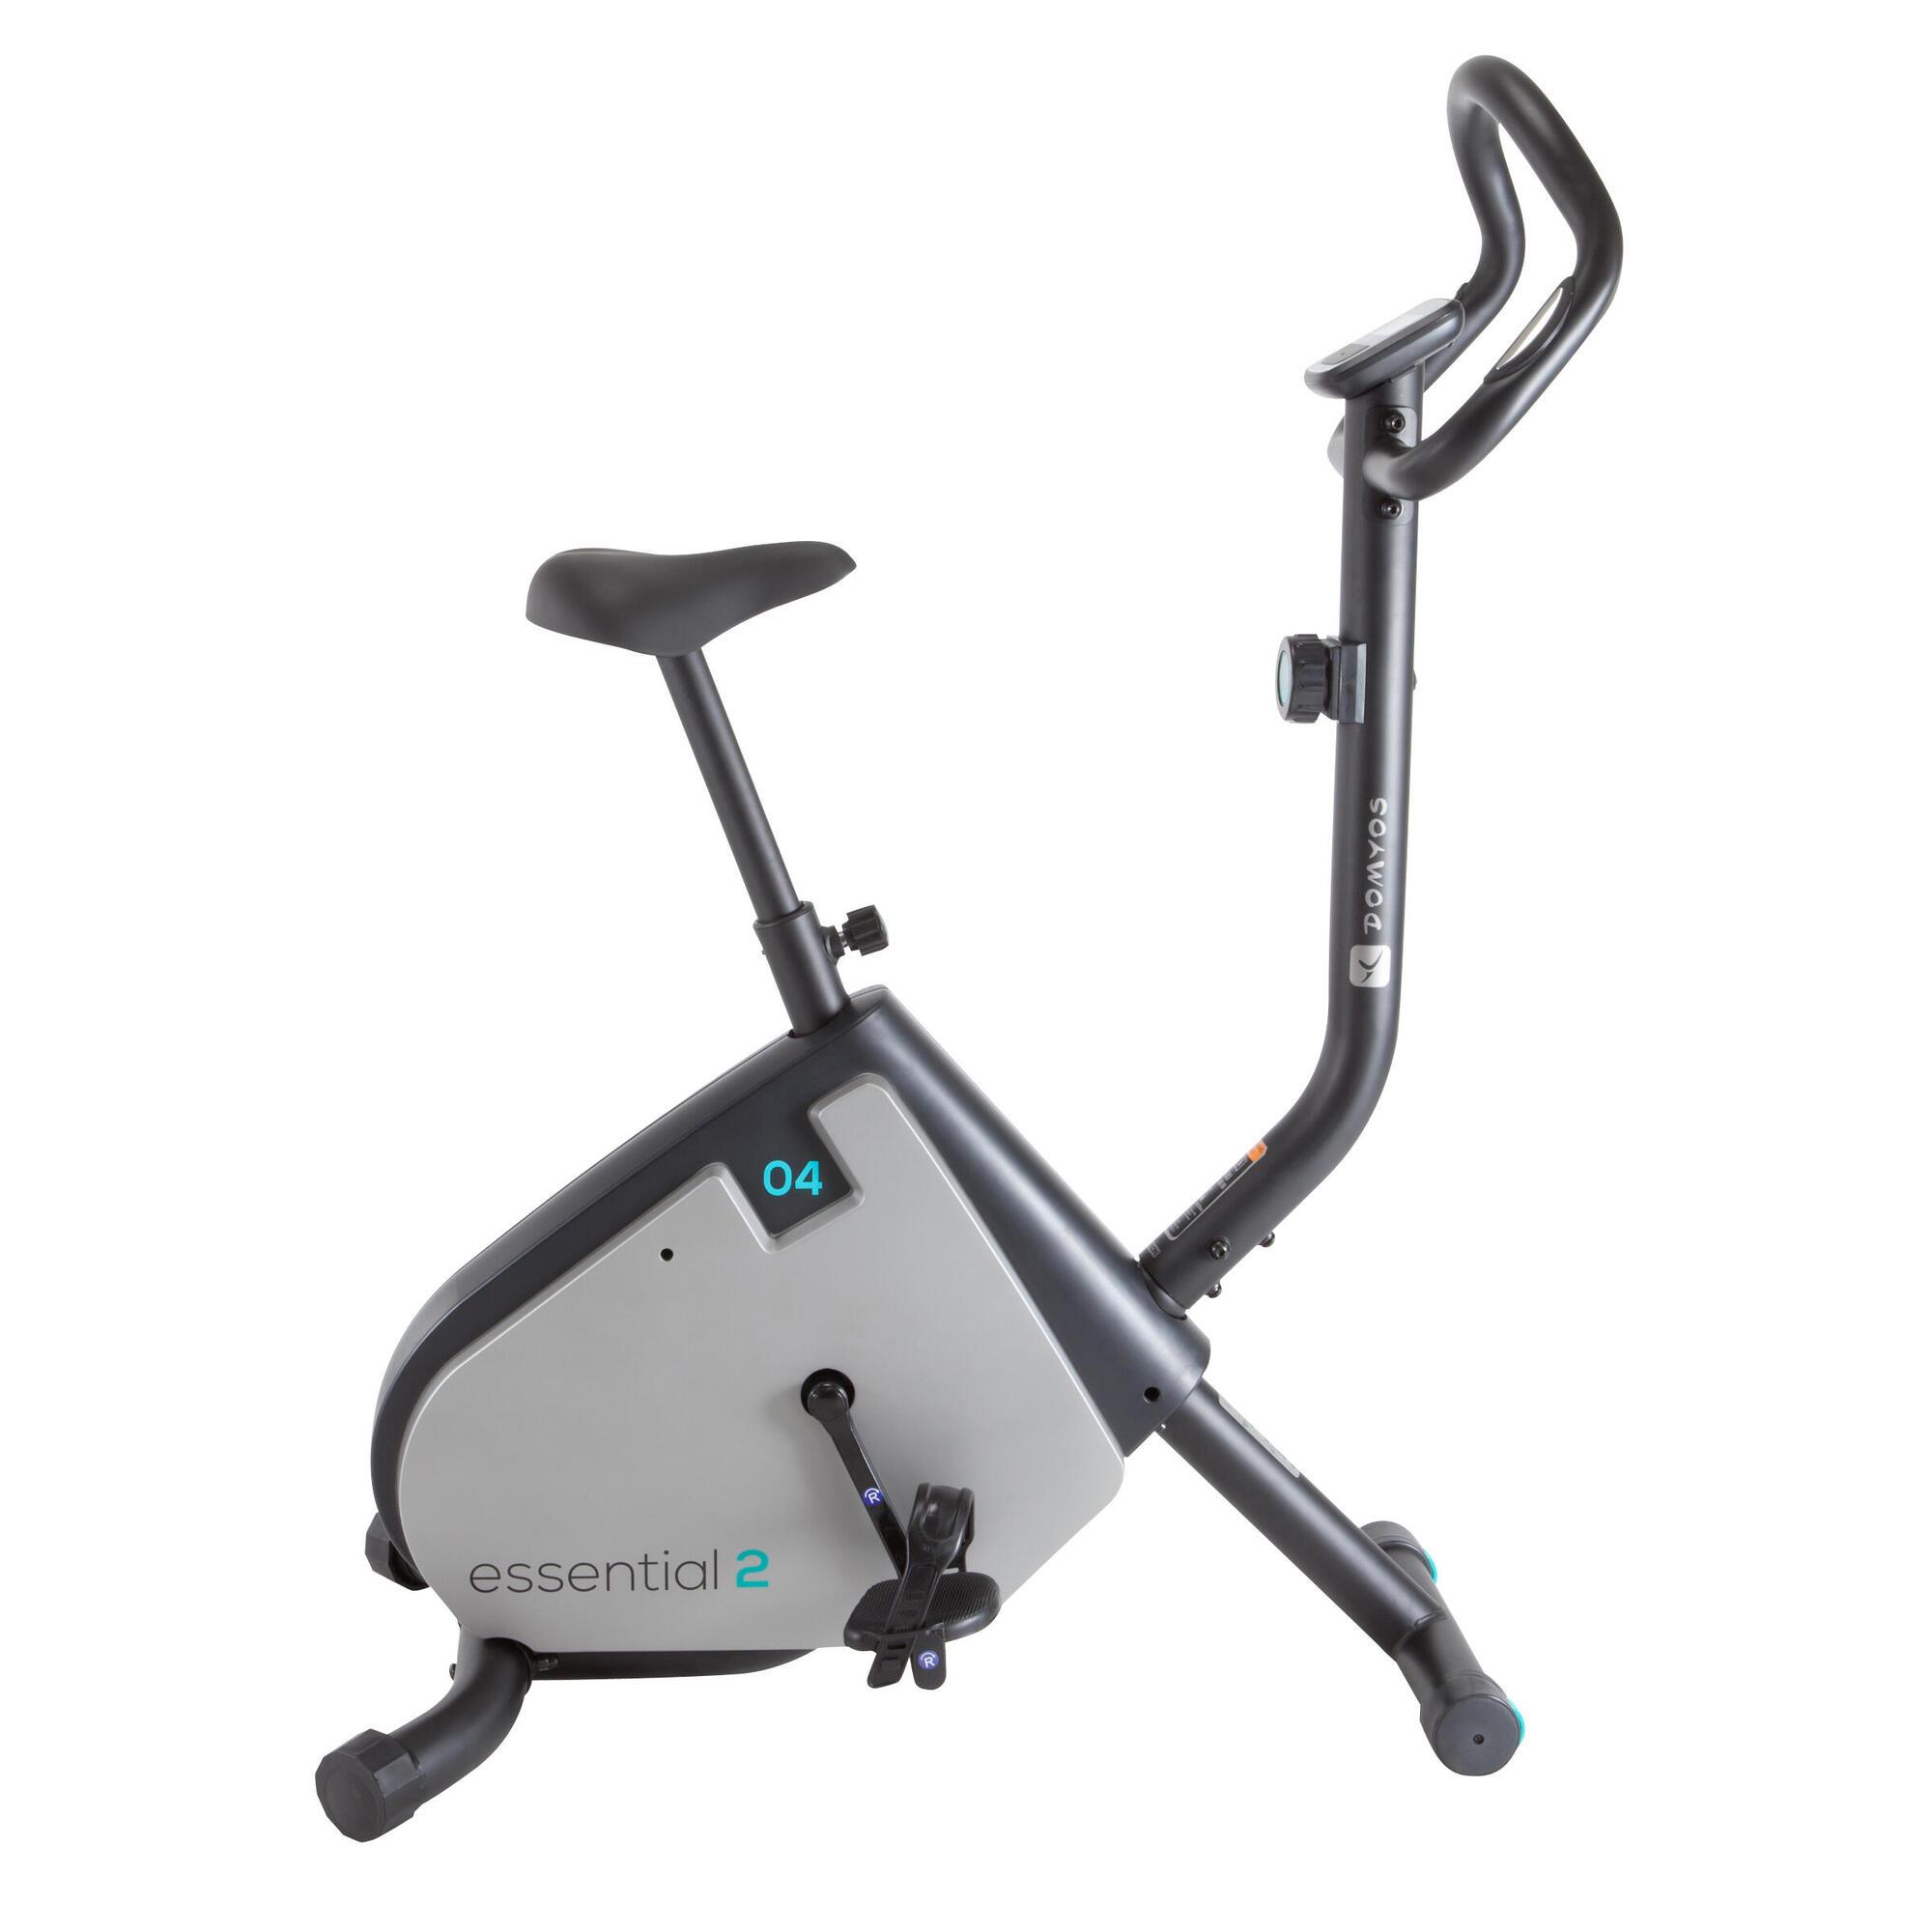 essential 2 exercise bike domyos by decathlon